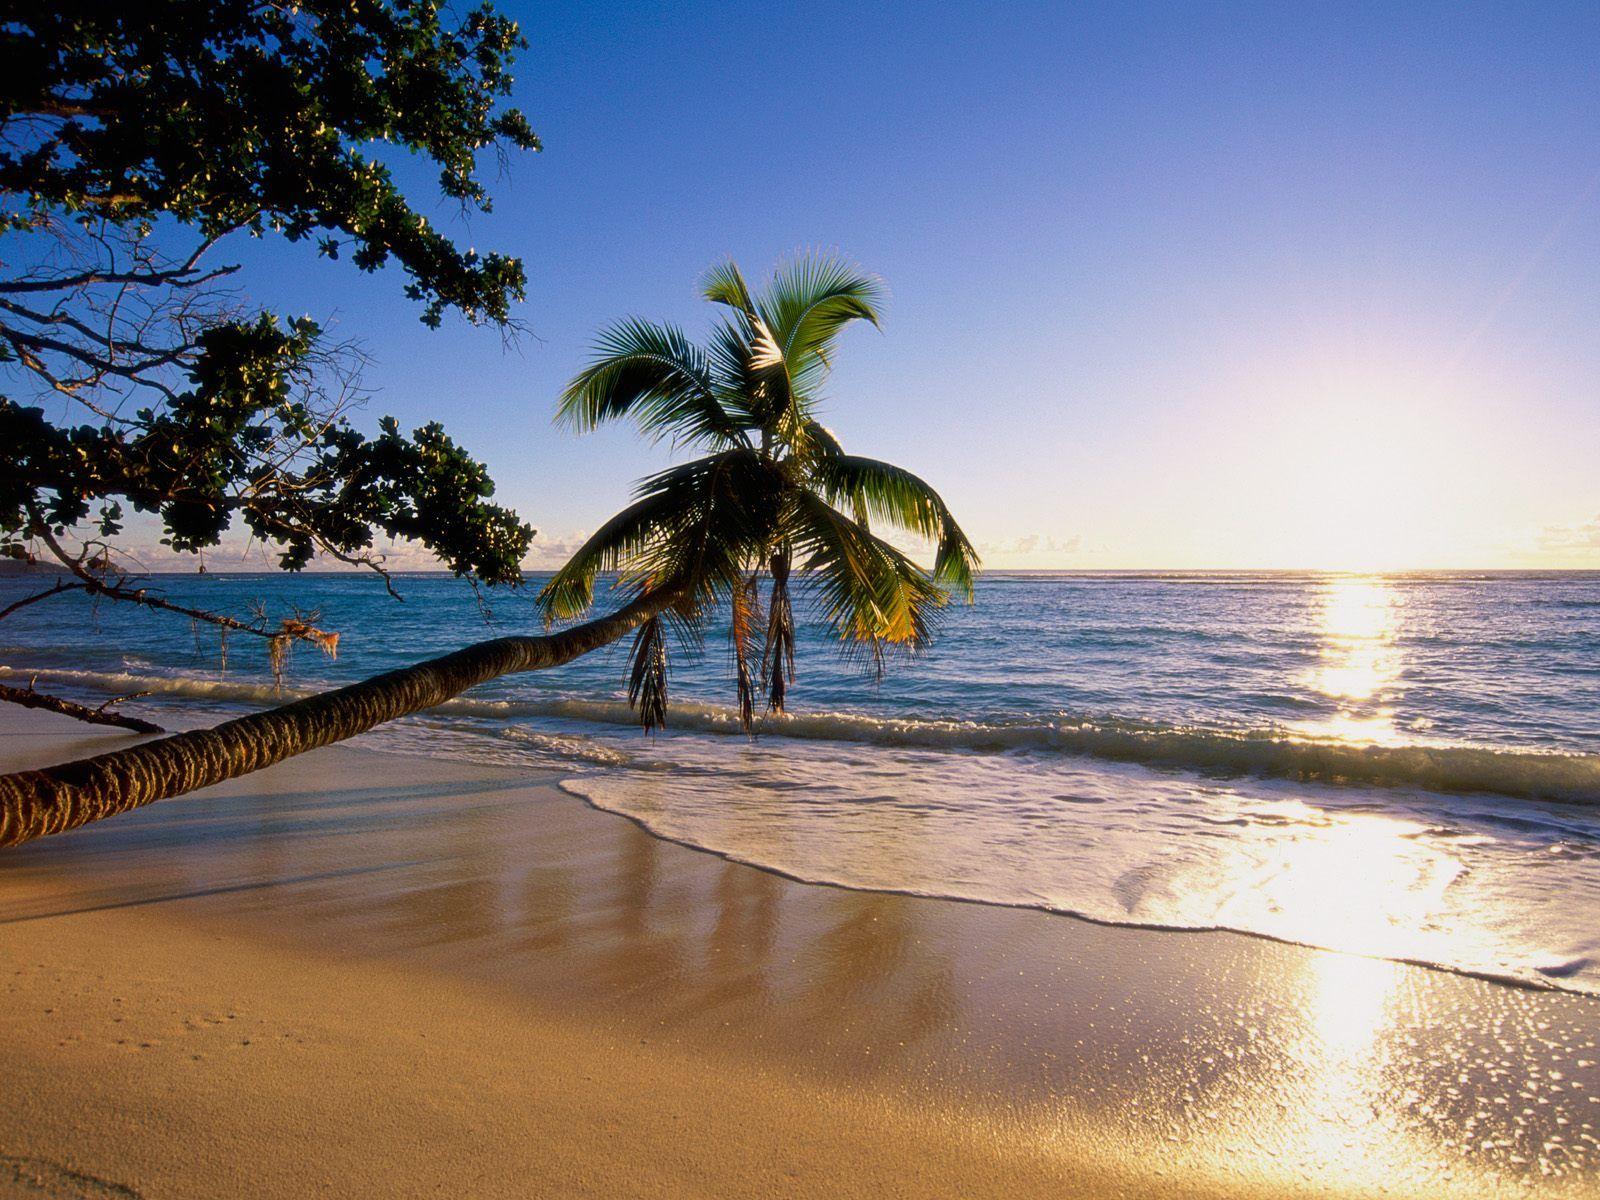 Island Scenery Tropical Beach Sun At Water Wallaper